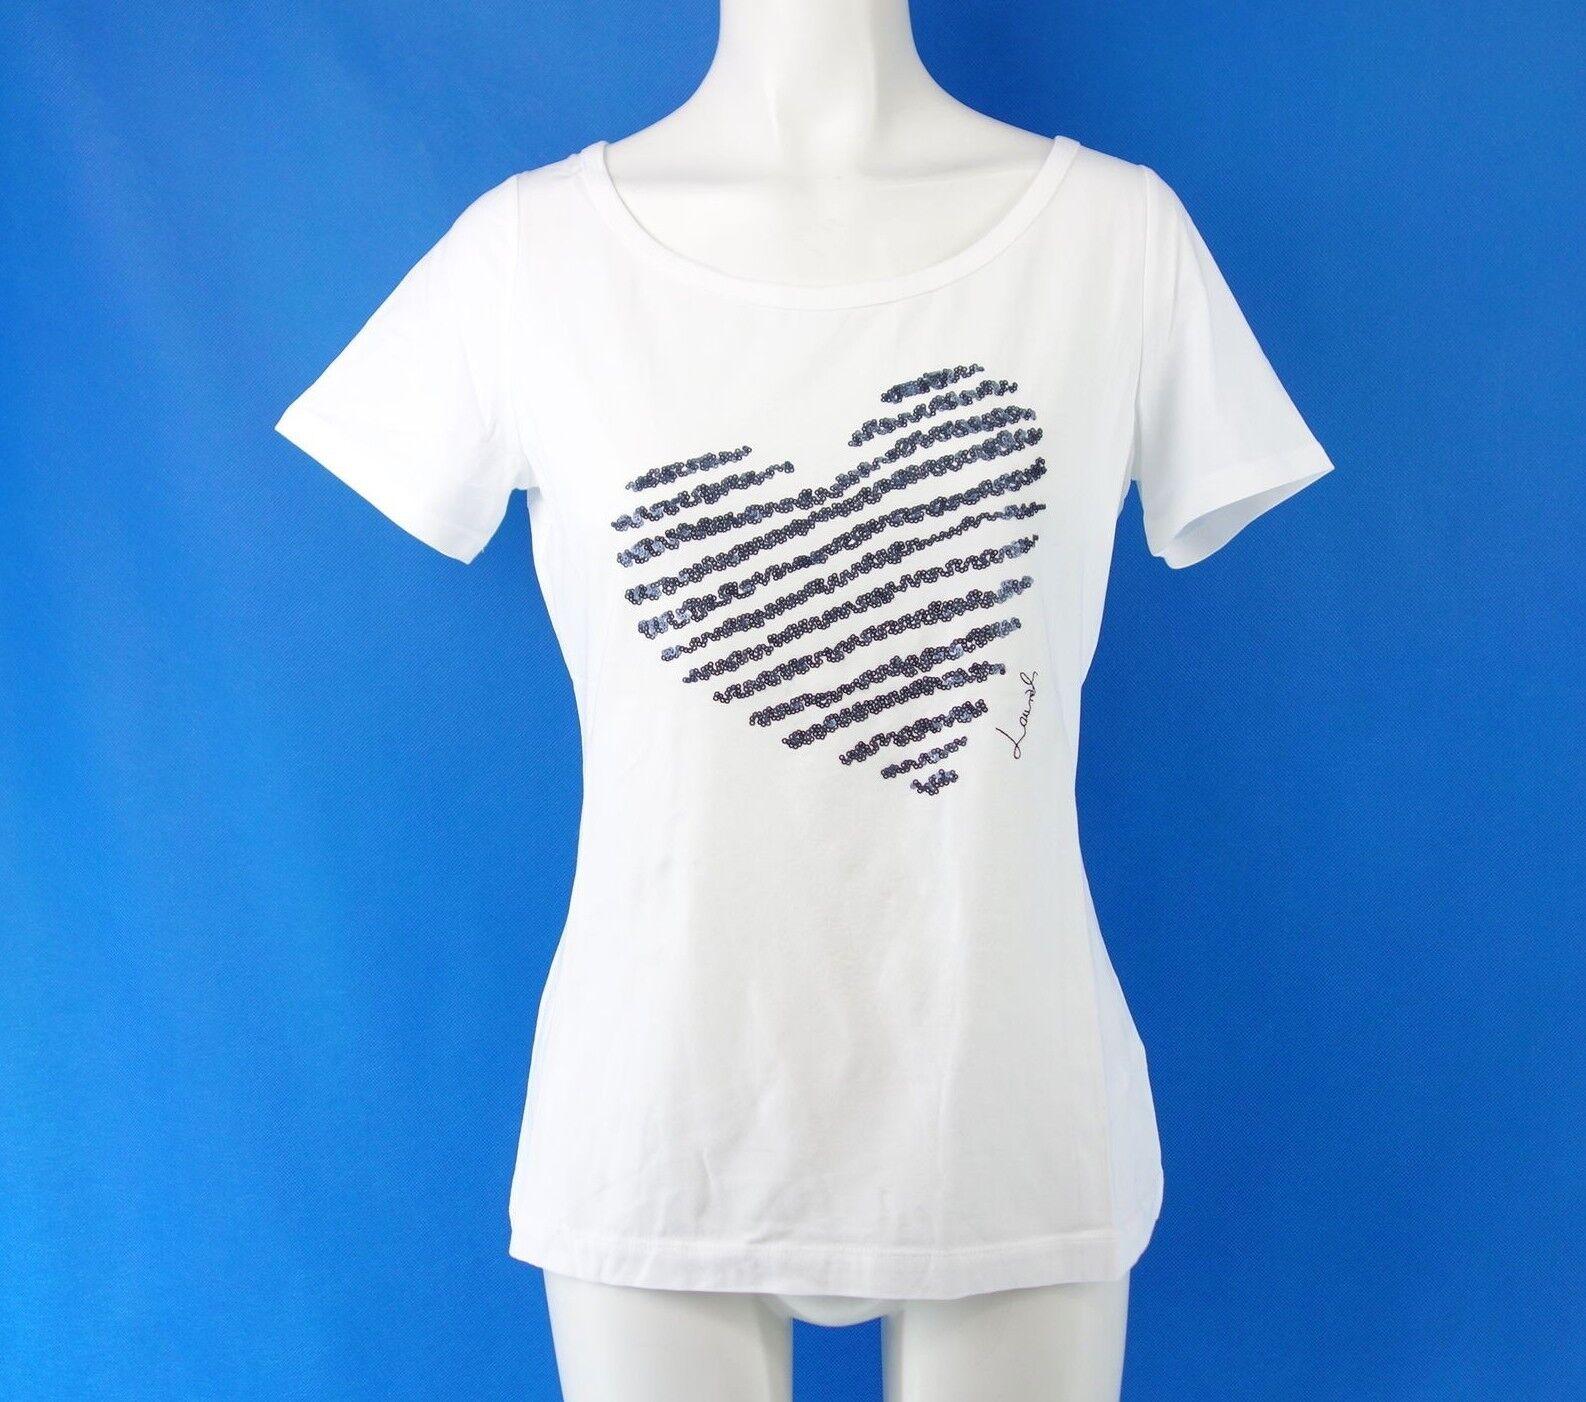 LAURÈL Laurel Damen Shirt 48248 Gr 38 42 Weiß Pailletten Herz Blau NP 99 NEU